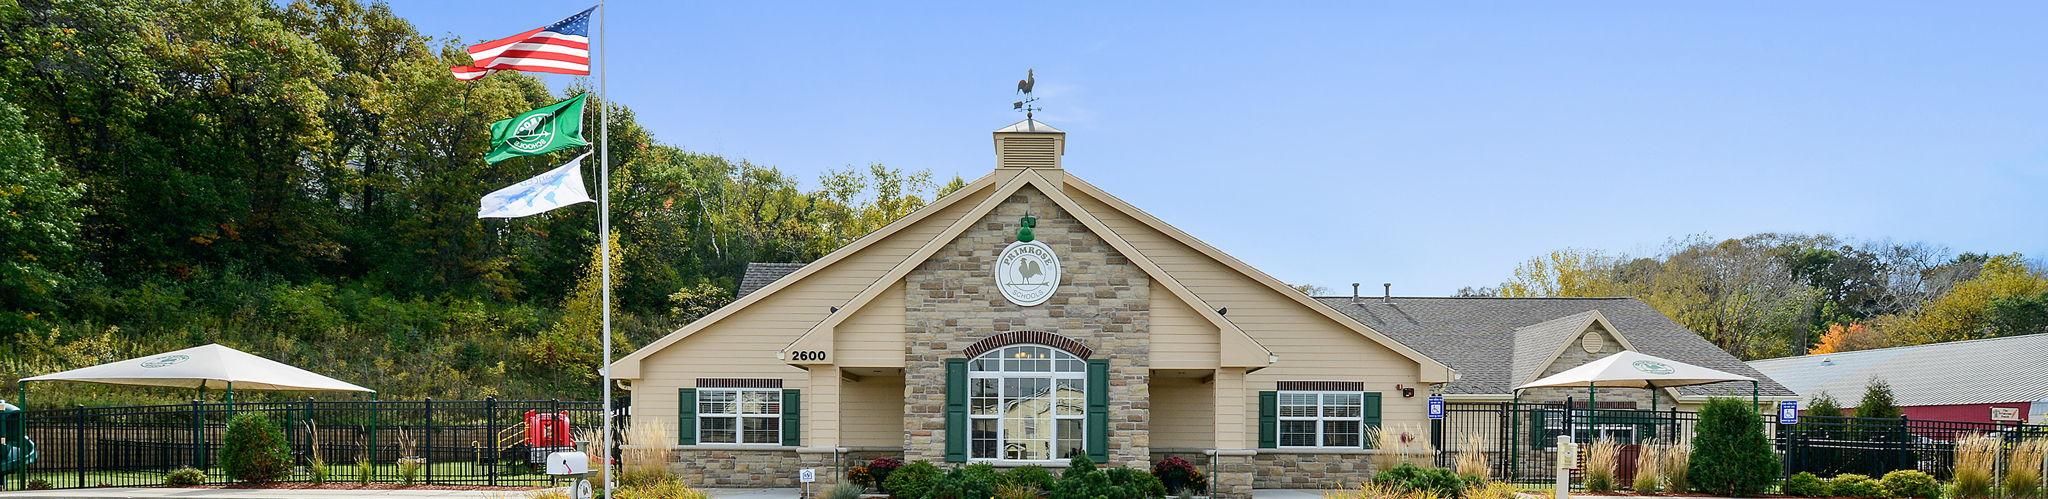 Primrose School Rochester MN